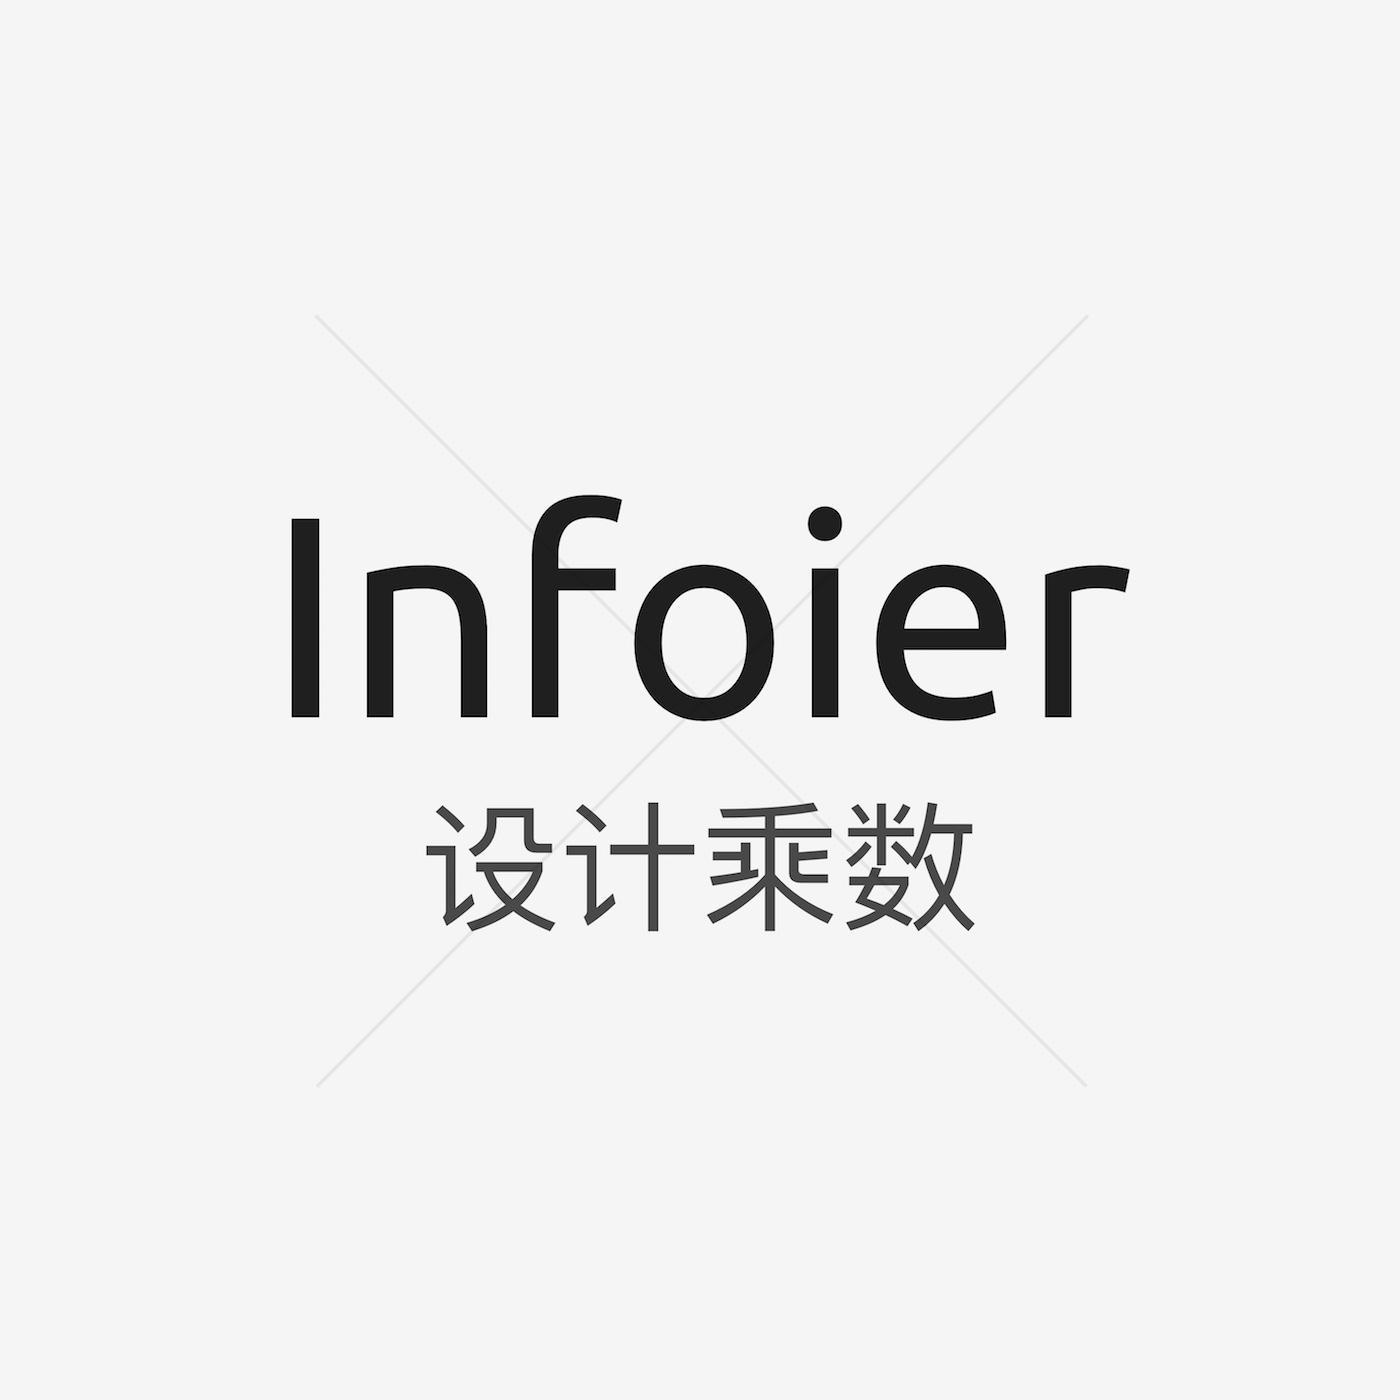 infoier | 设计乘数